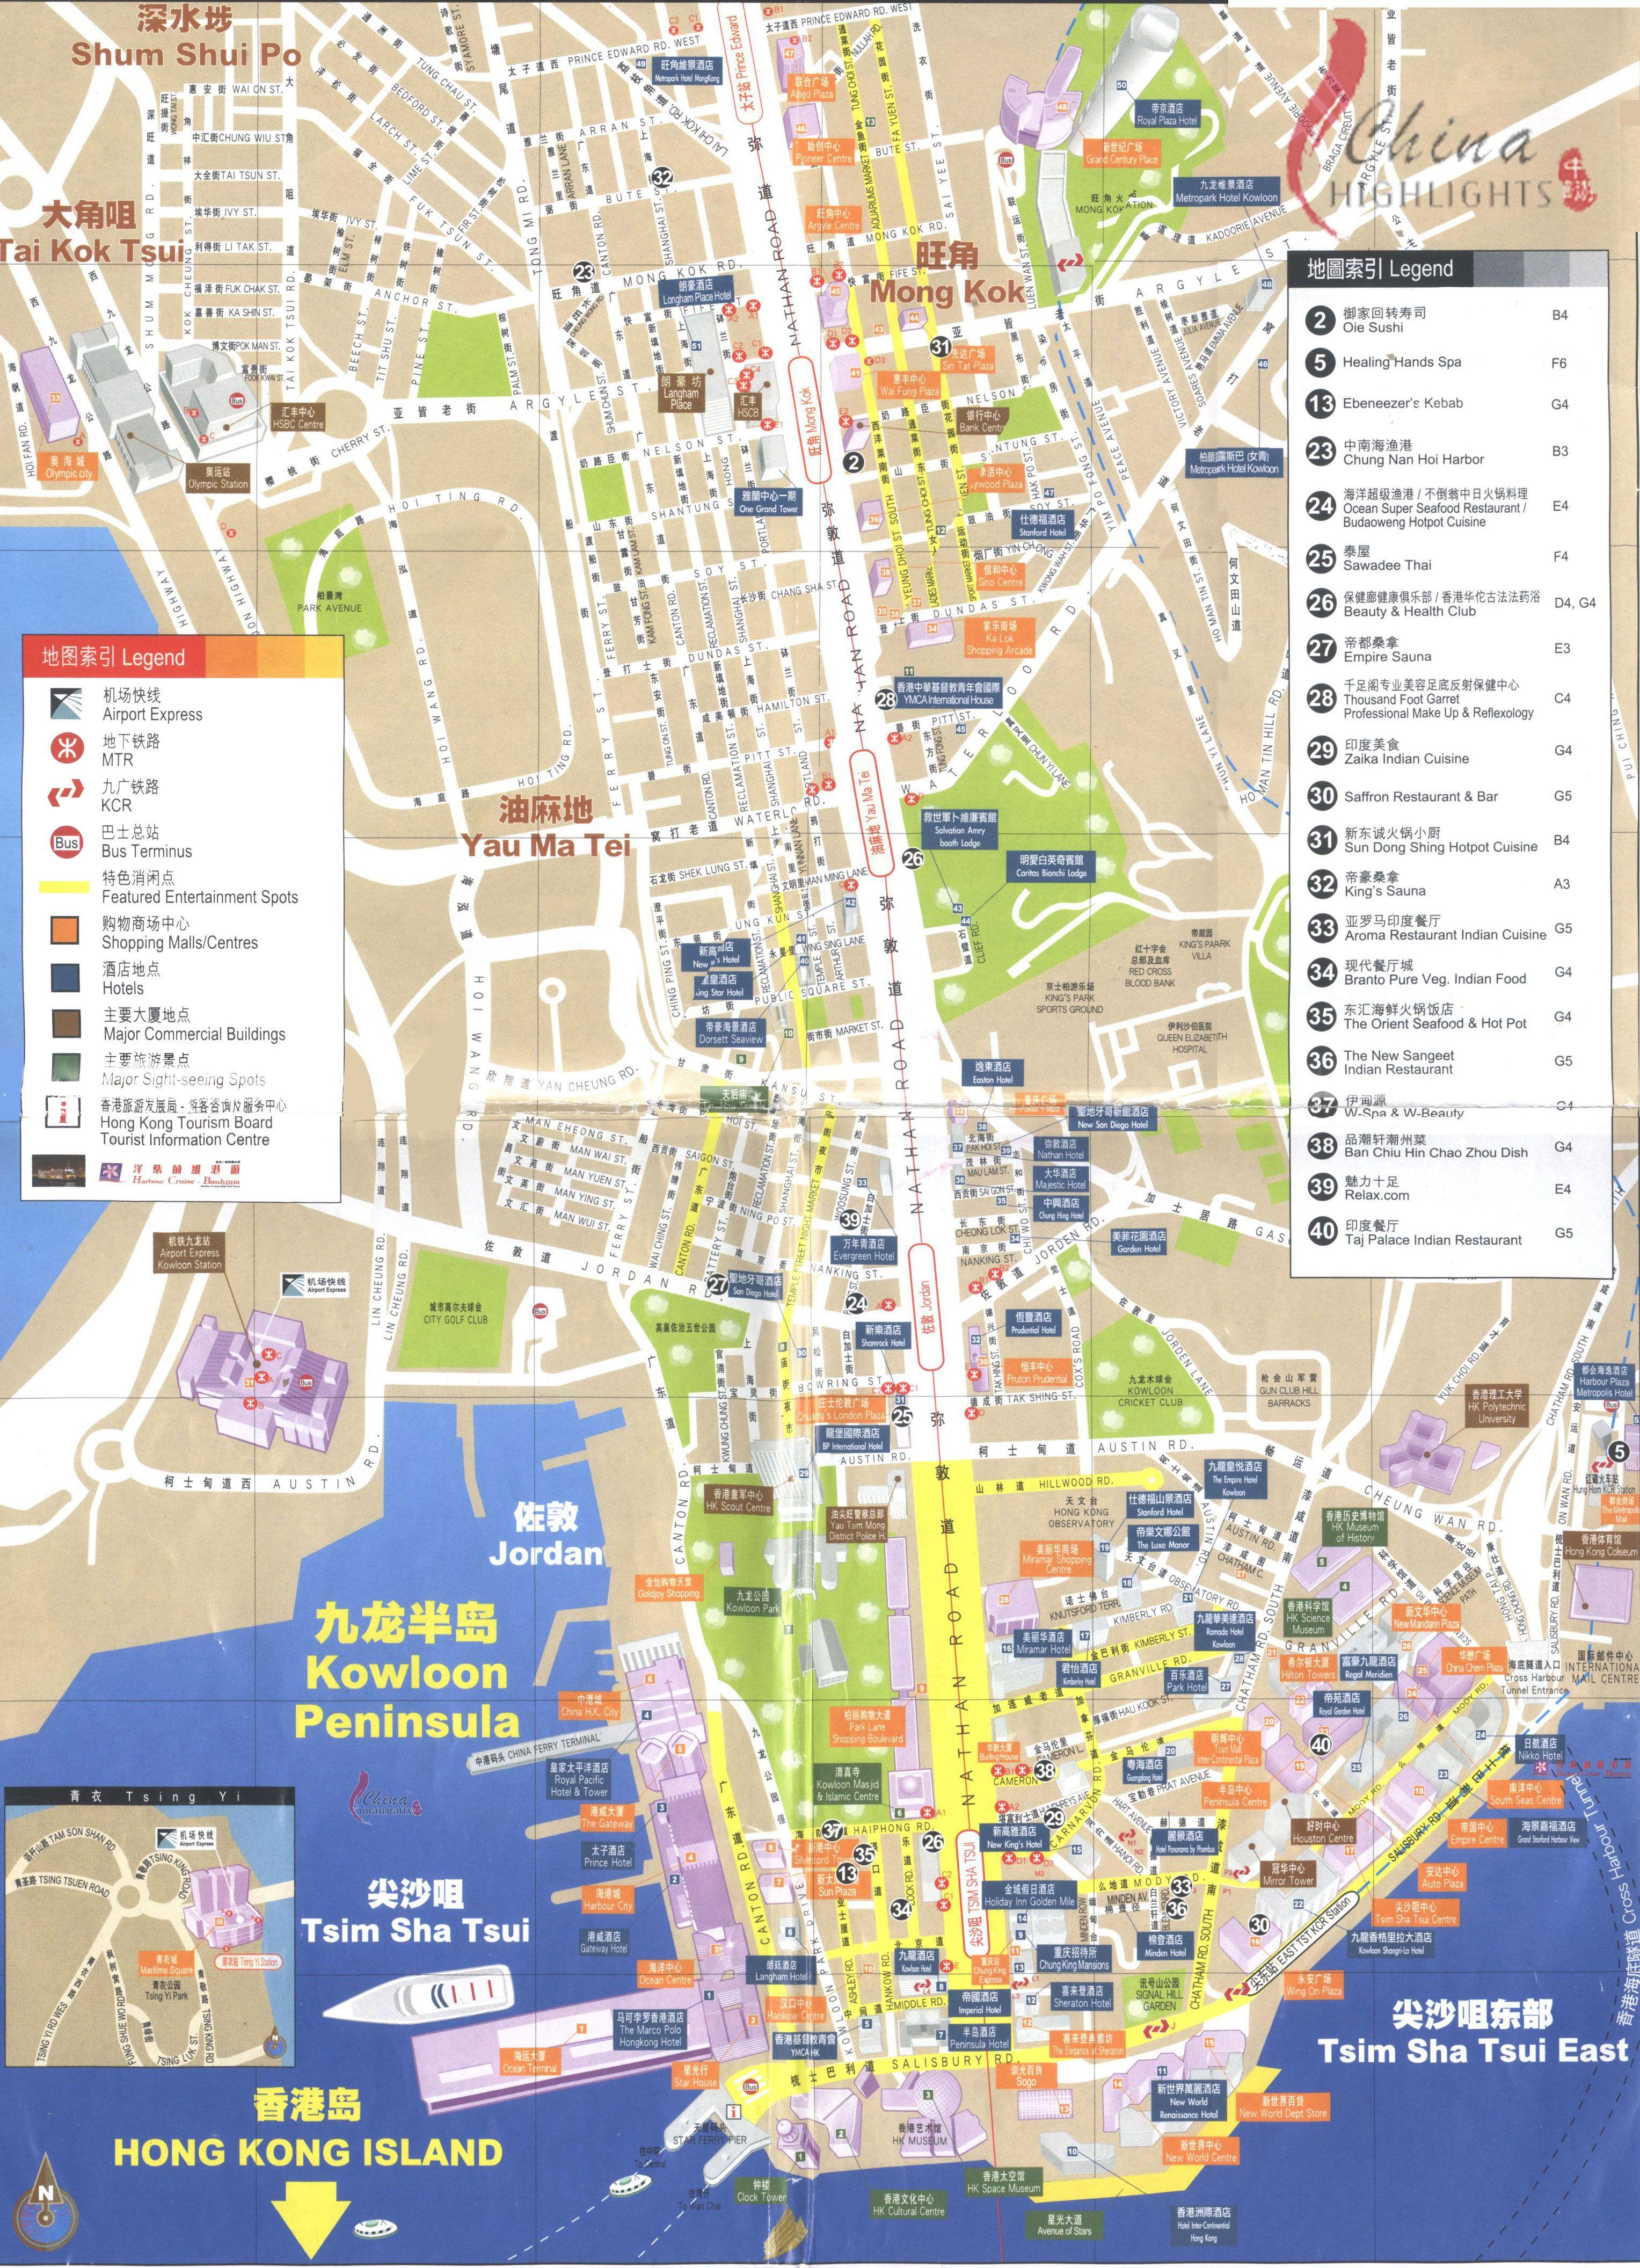 hong kong city map | Map | Map, Hong kong, Kowloon hong kong Kowloon Hong Kong Map on singapore map, kowloon city map, kowloon mtr map, mongkok map, tsim sha tsui map, kowloon china, santo domingo dominican republic map, harbour grand kowloon map, hk map, kowloon street map in chinese, nathan road kowloon map, kowloon bus route map, shenzhen map, macau map, kowloon map of attractions, china map, hangzhou map, shanghai map,